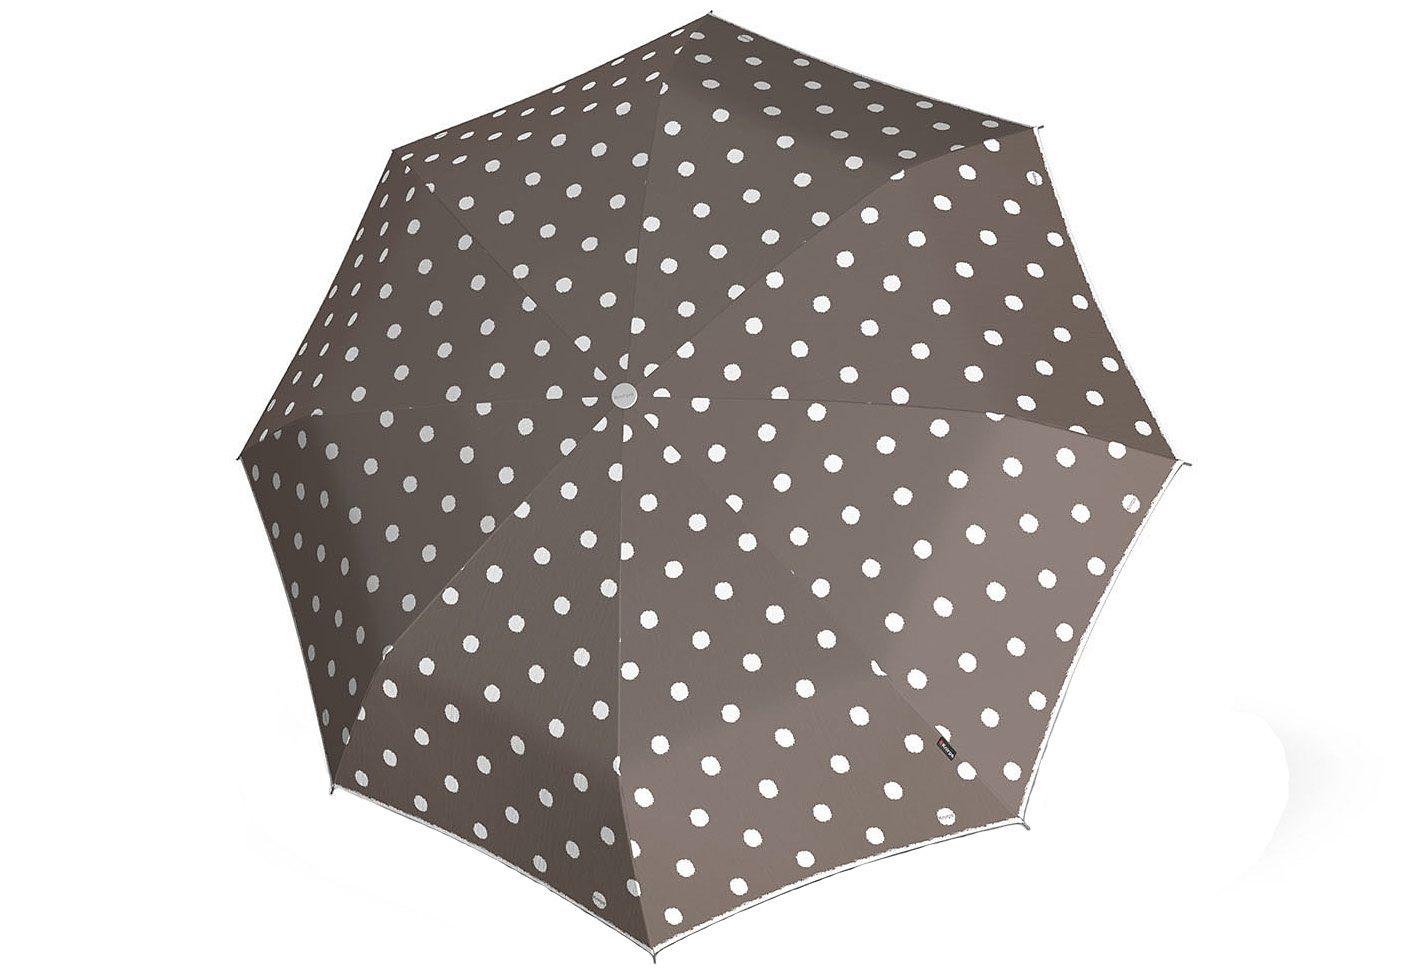 Knirps Regenschirm, »Stick Langschirm Automatik - Punkte taupe«